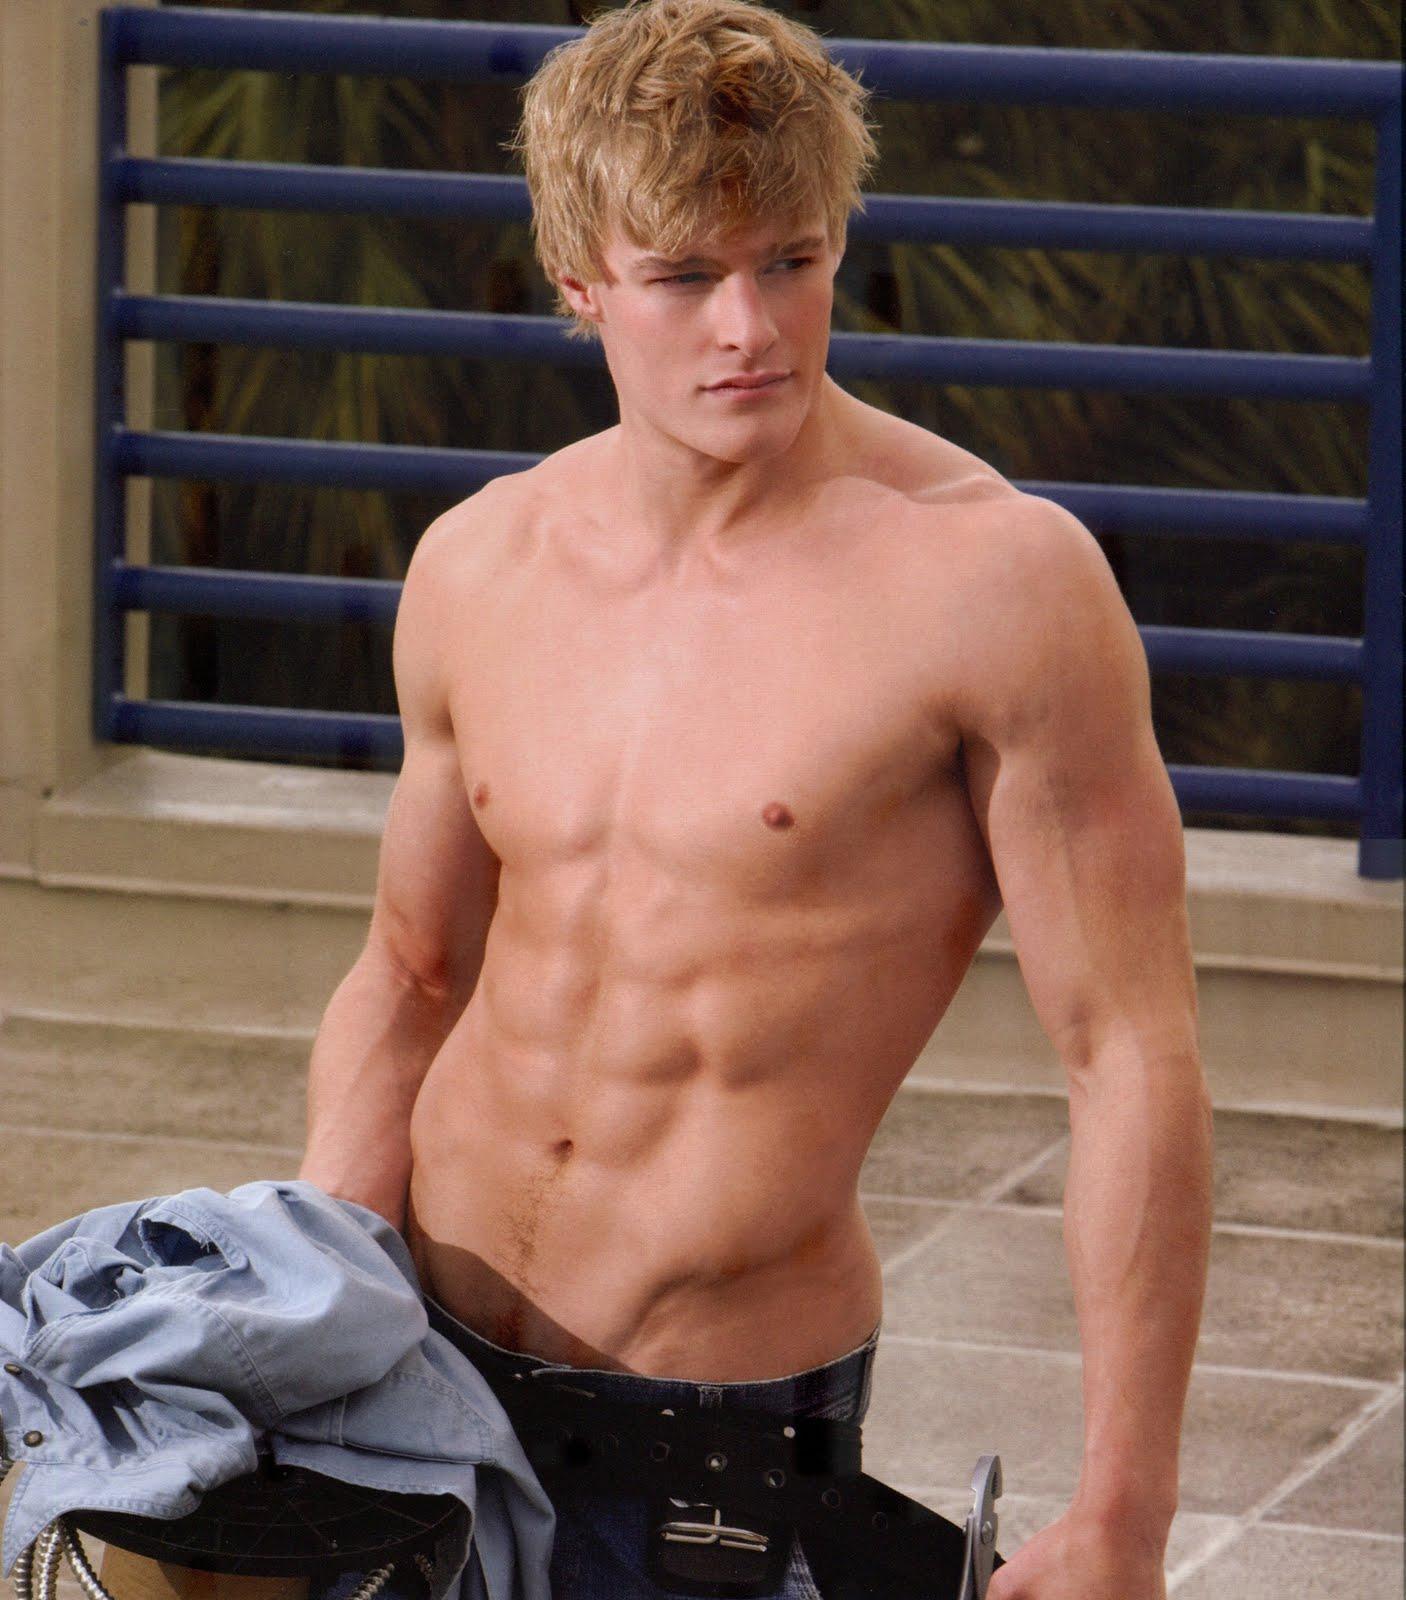 Blonde guys nude Nude Photos 29